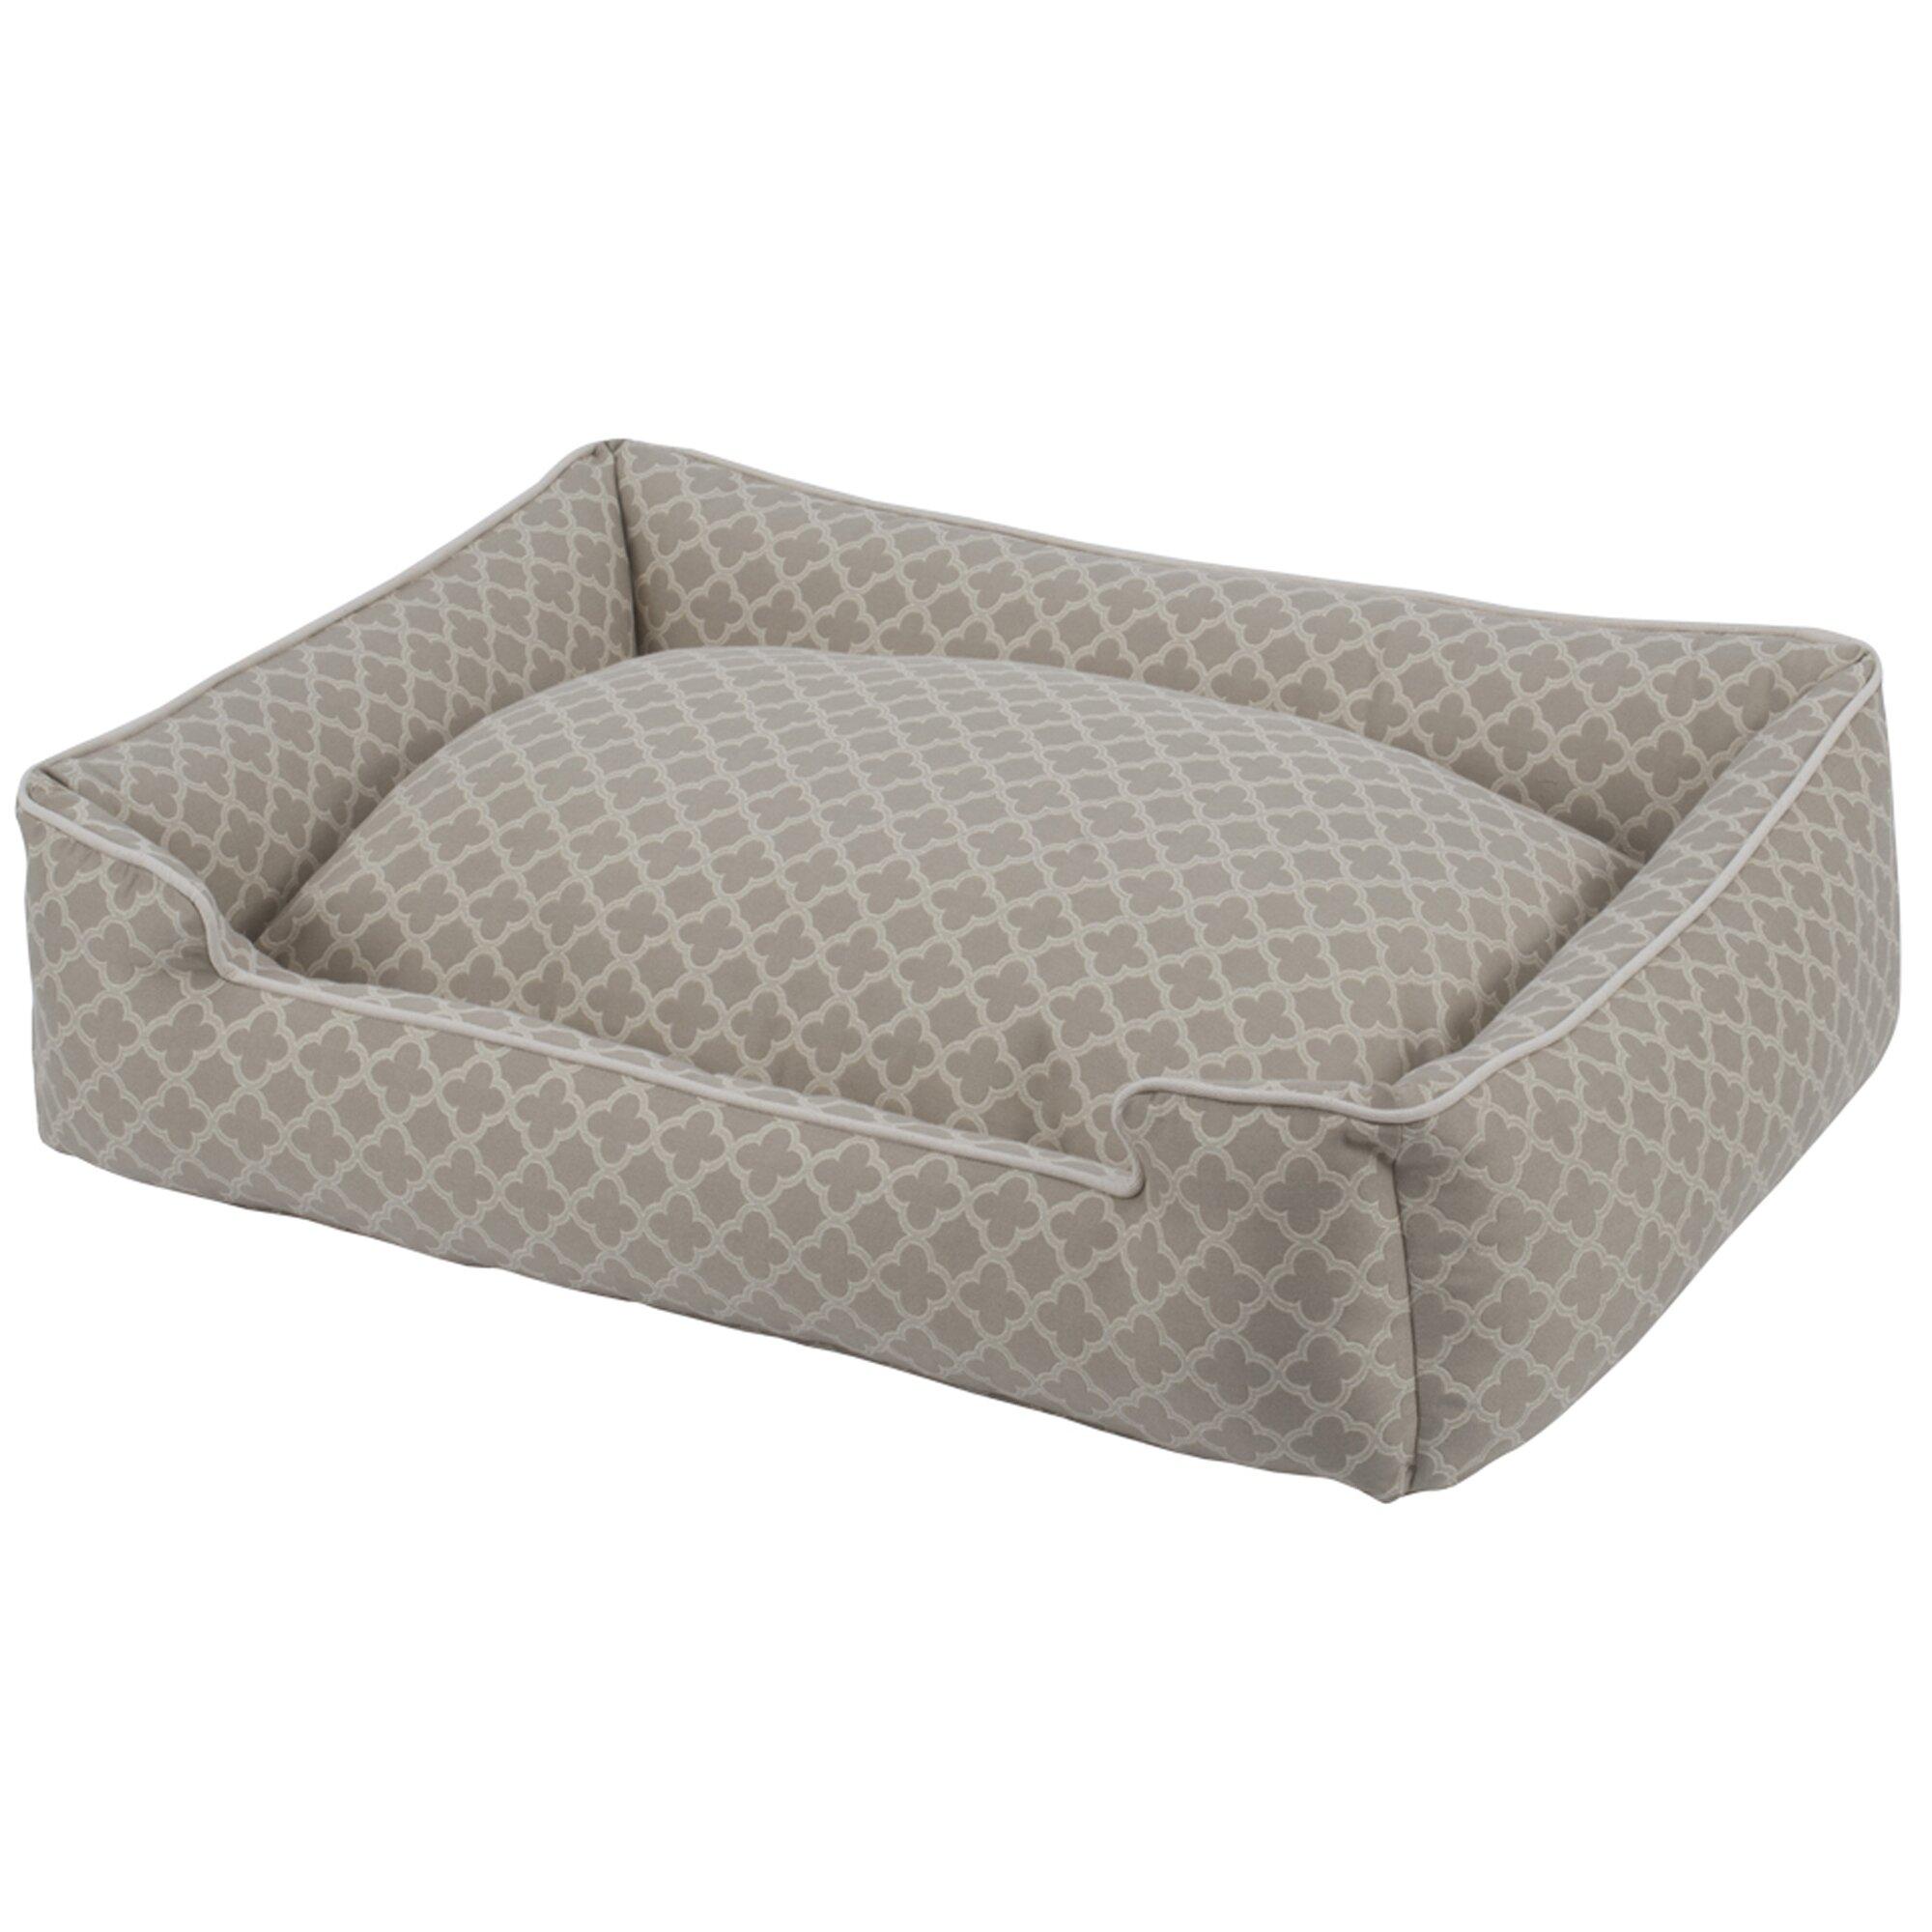 jax and bones vienna premium lounge bolster dog bed reviews wayfair. Black Bedroom Furniture Sets. Home Design Ideas